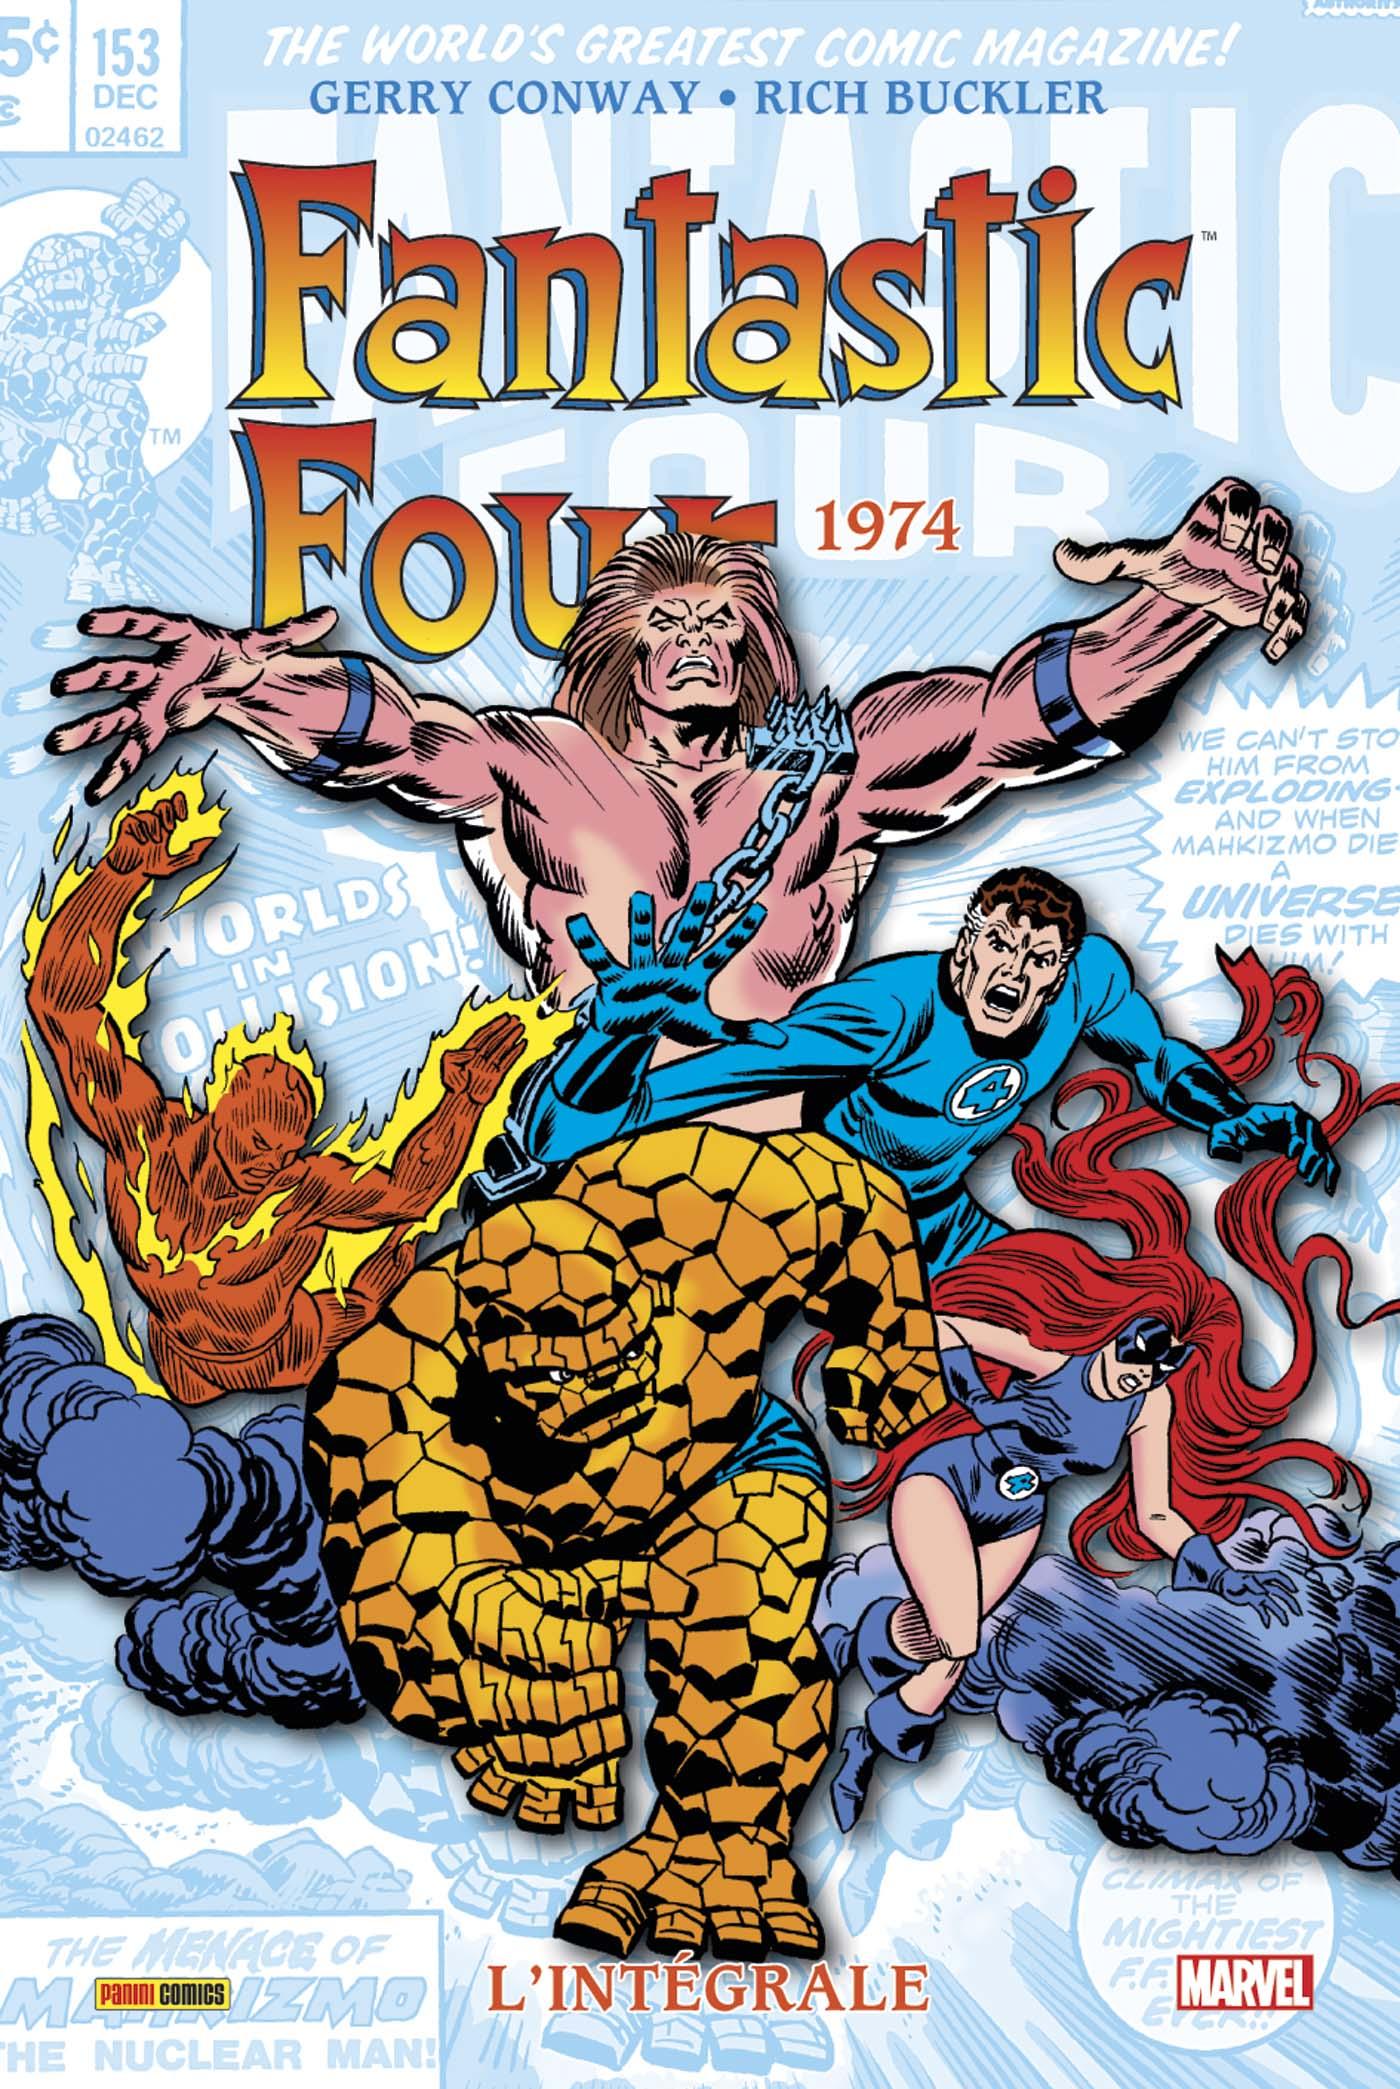 Fantastic Four 1974 - 1974